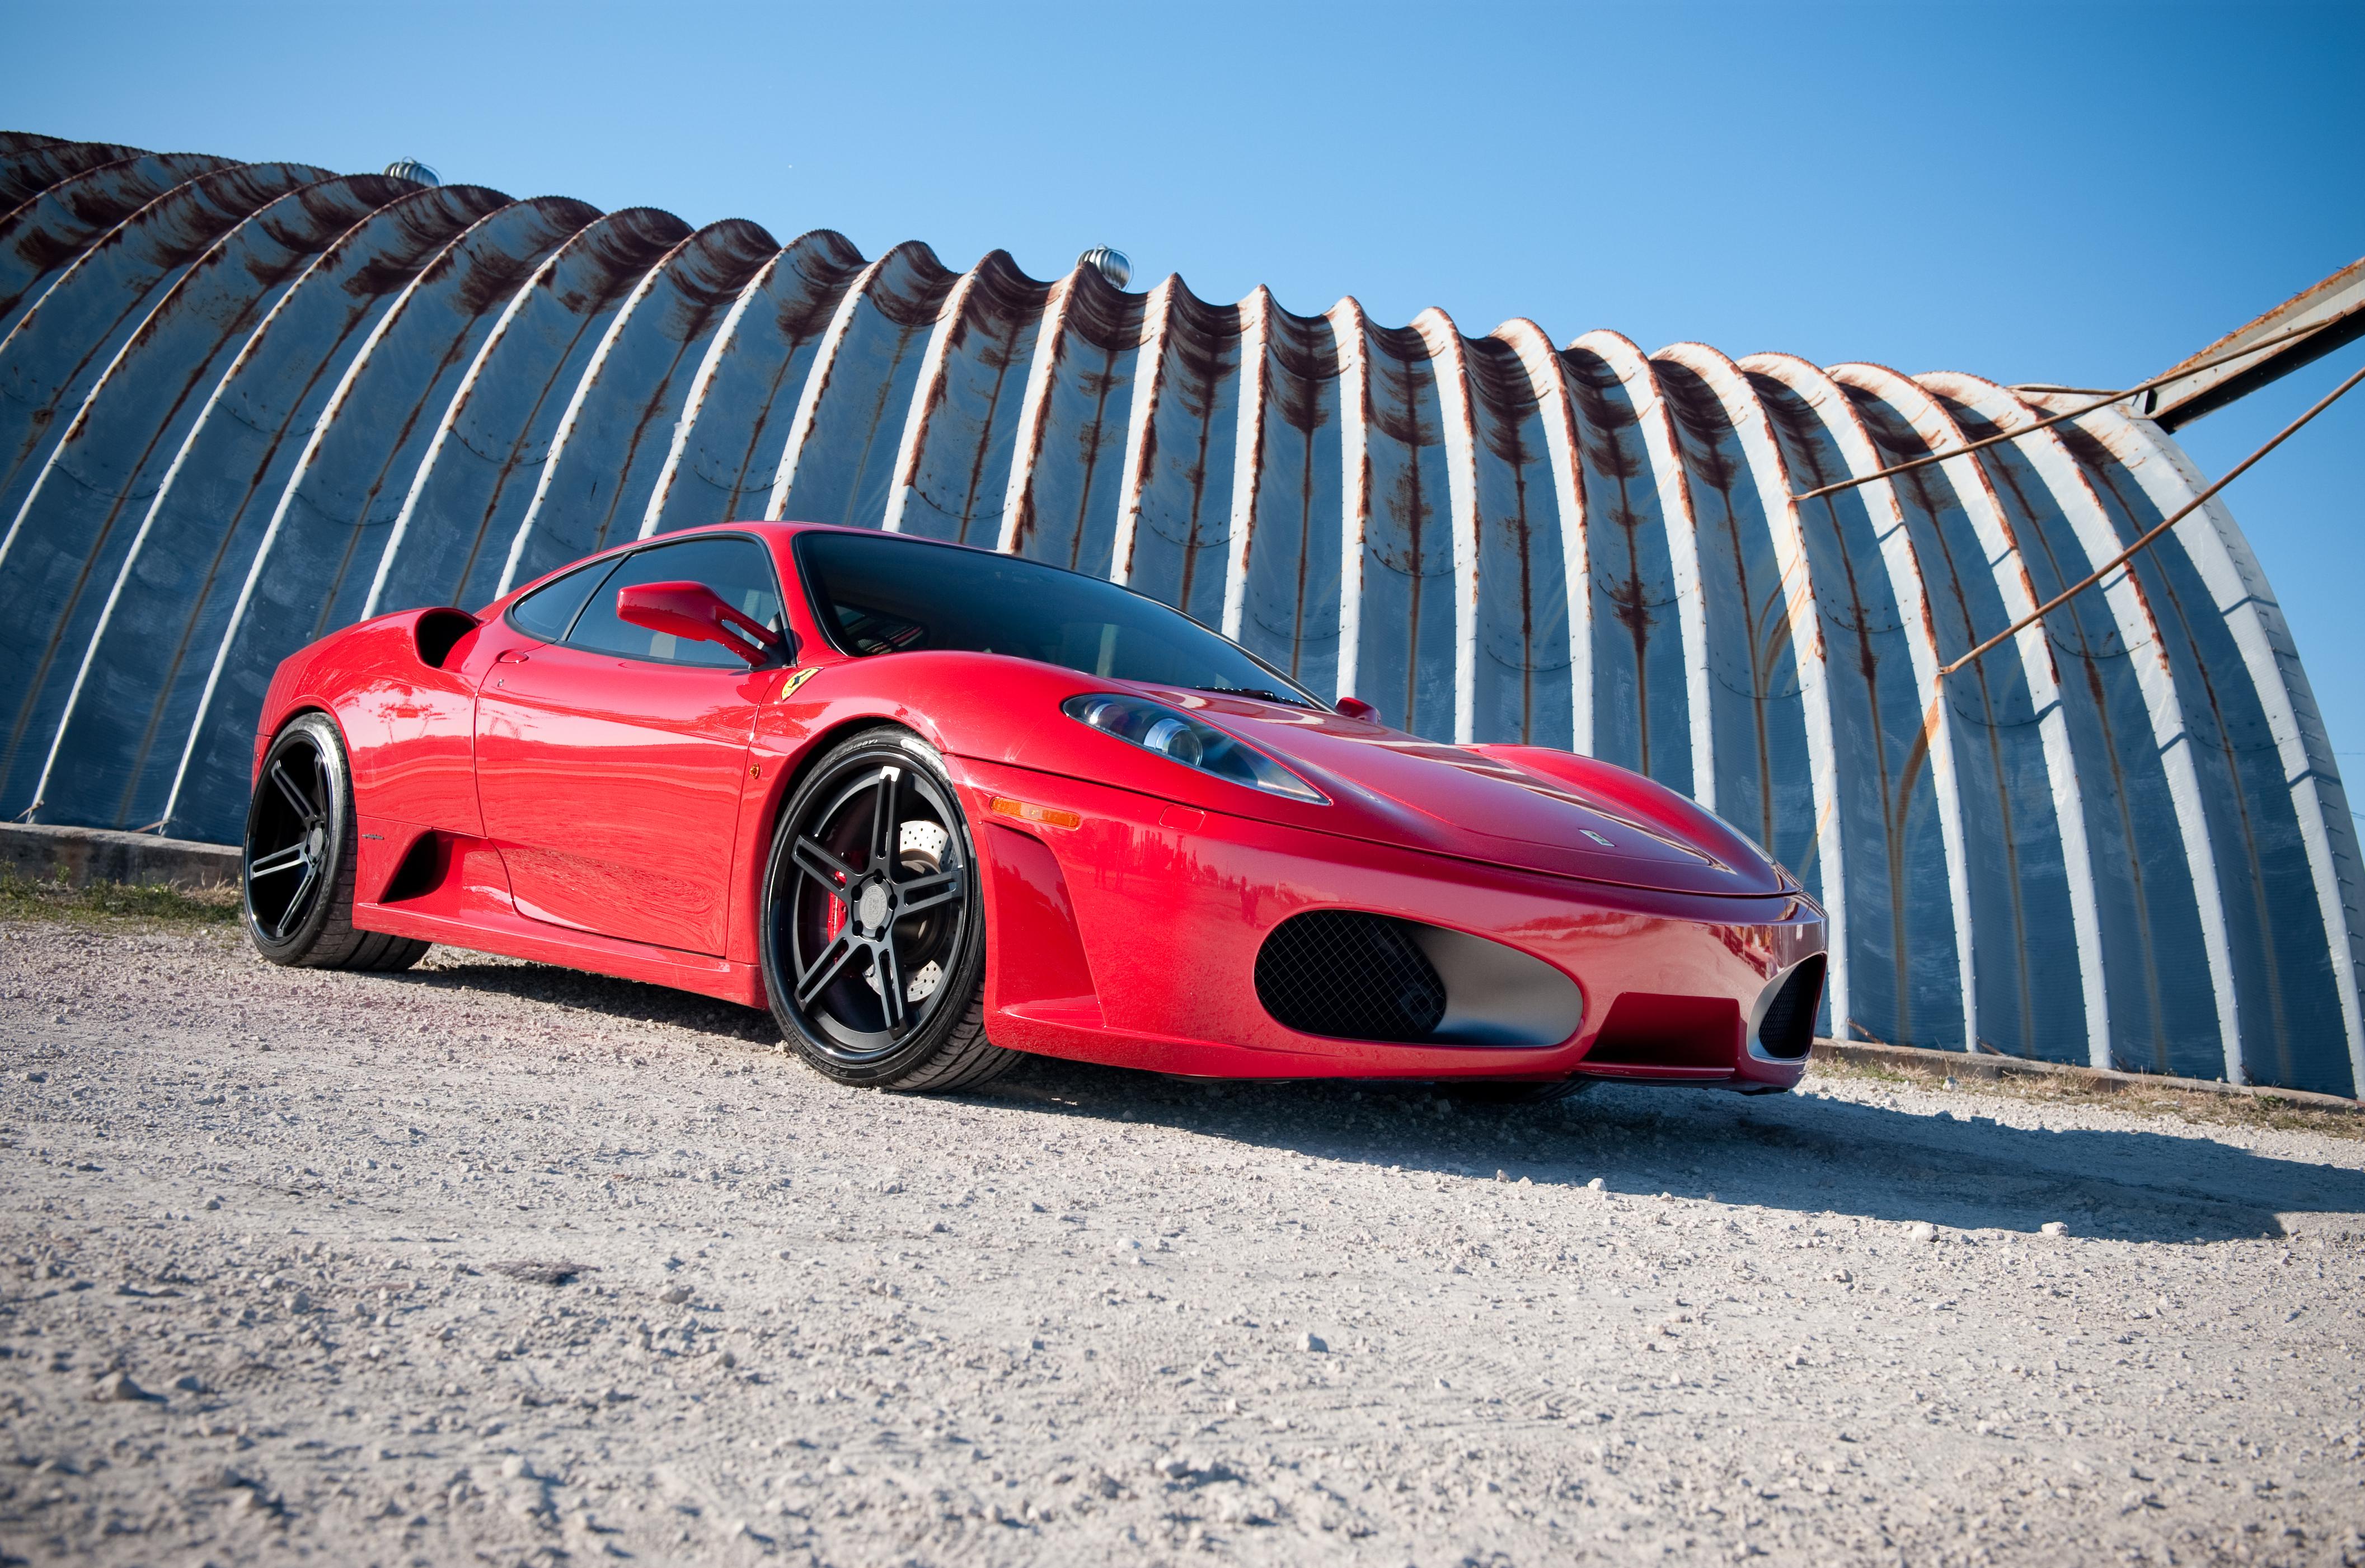 ferrari, f430, red Wallpaper, HD Cars 4K Wallpapers ...